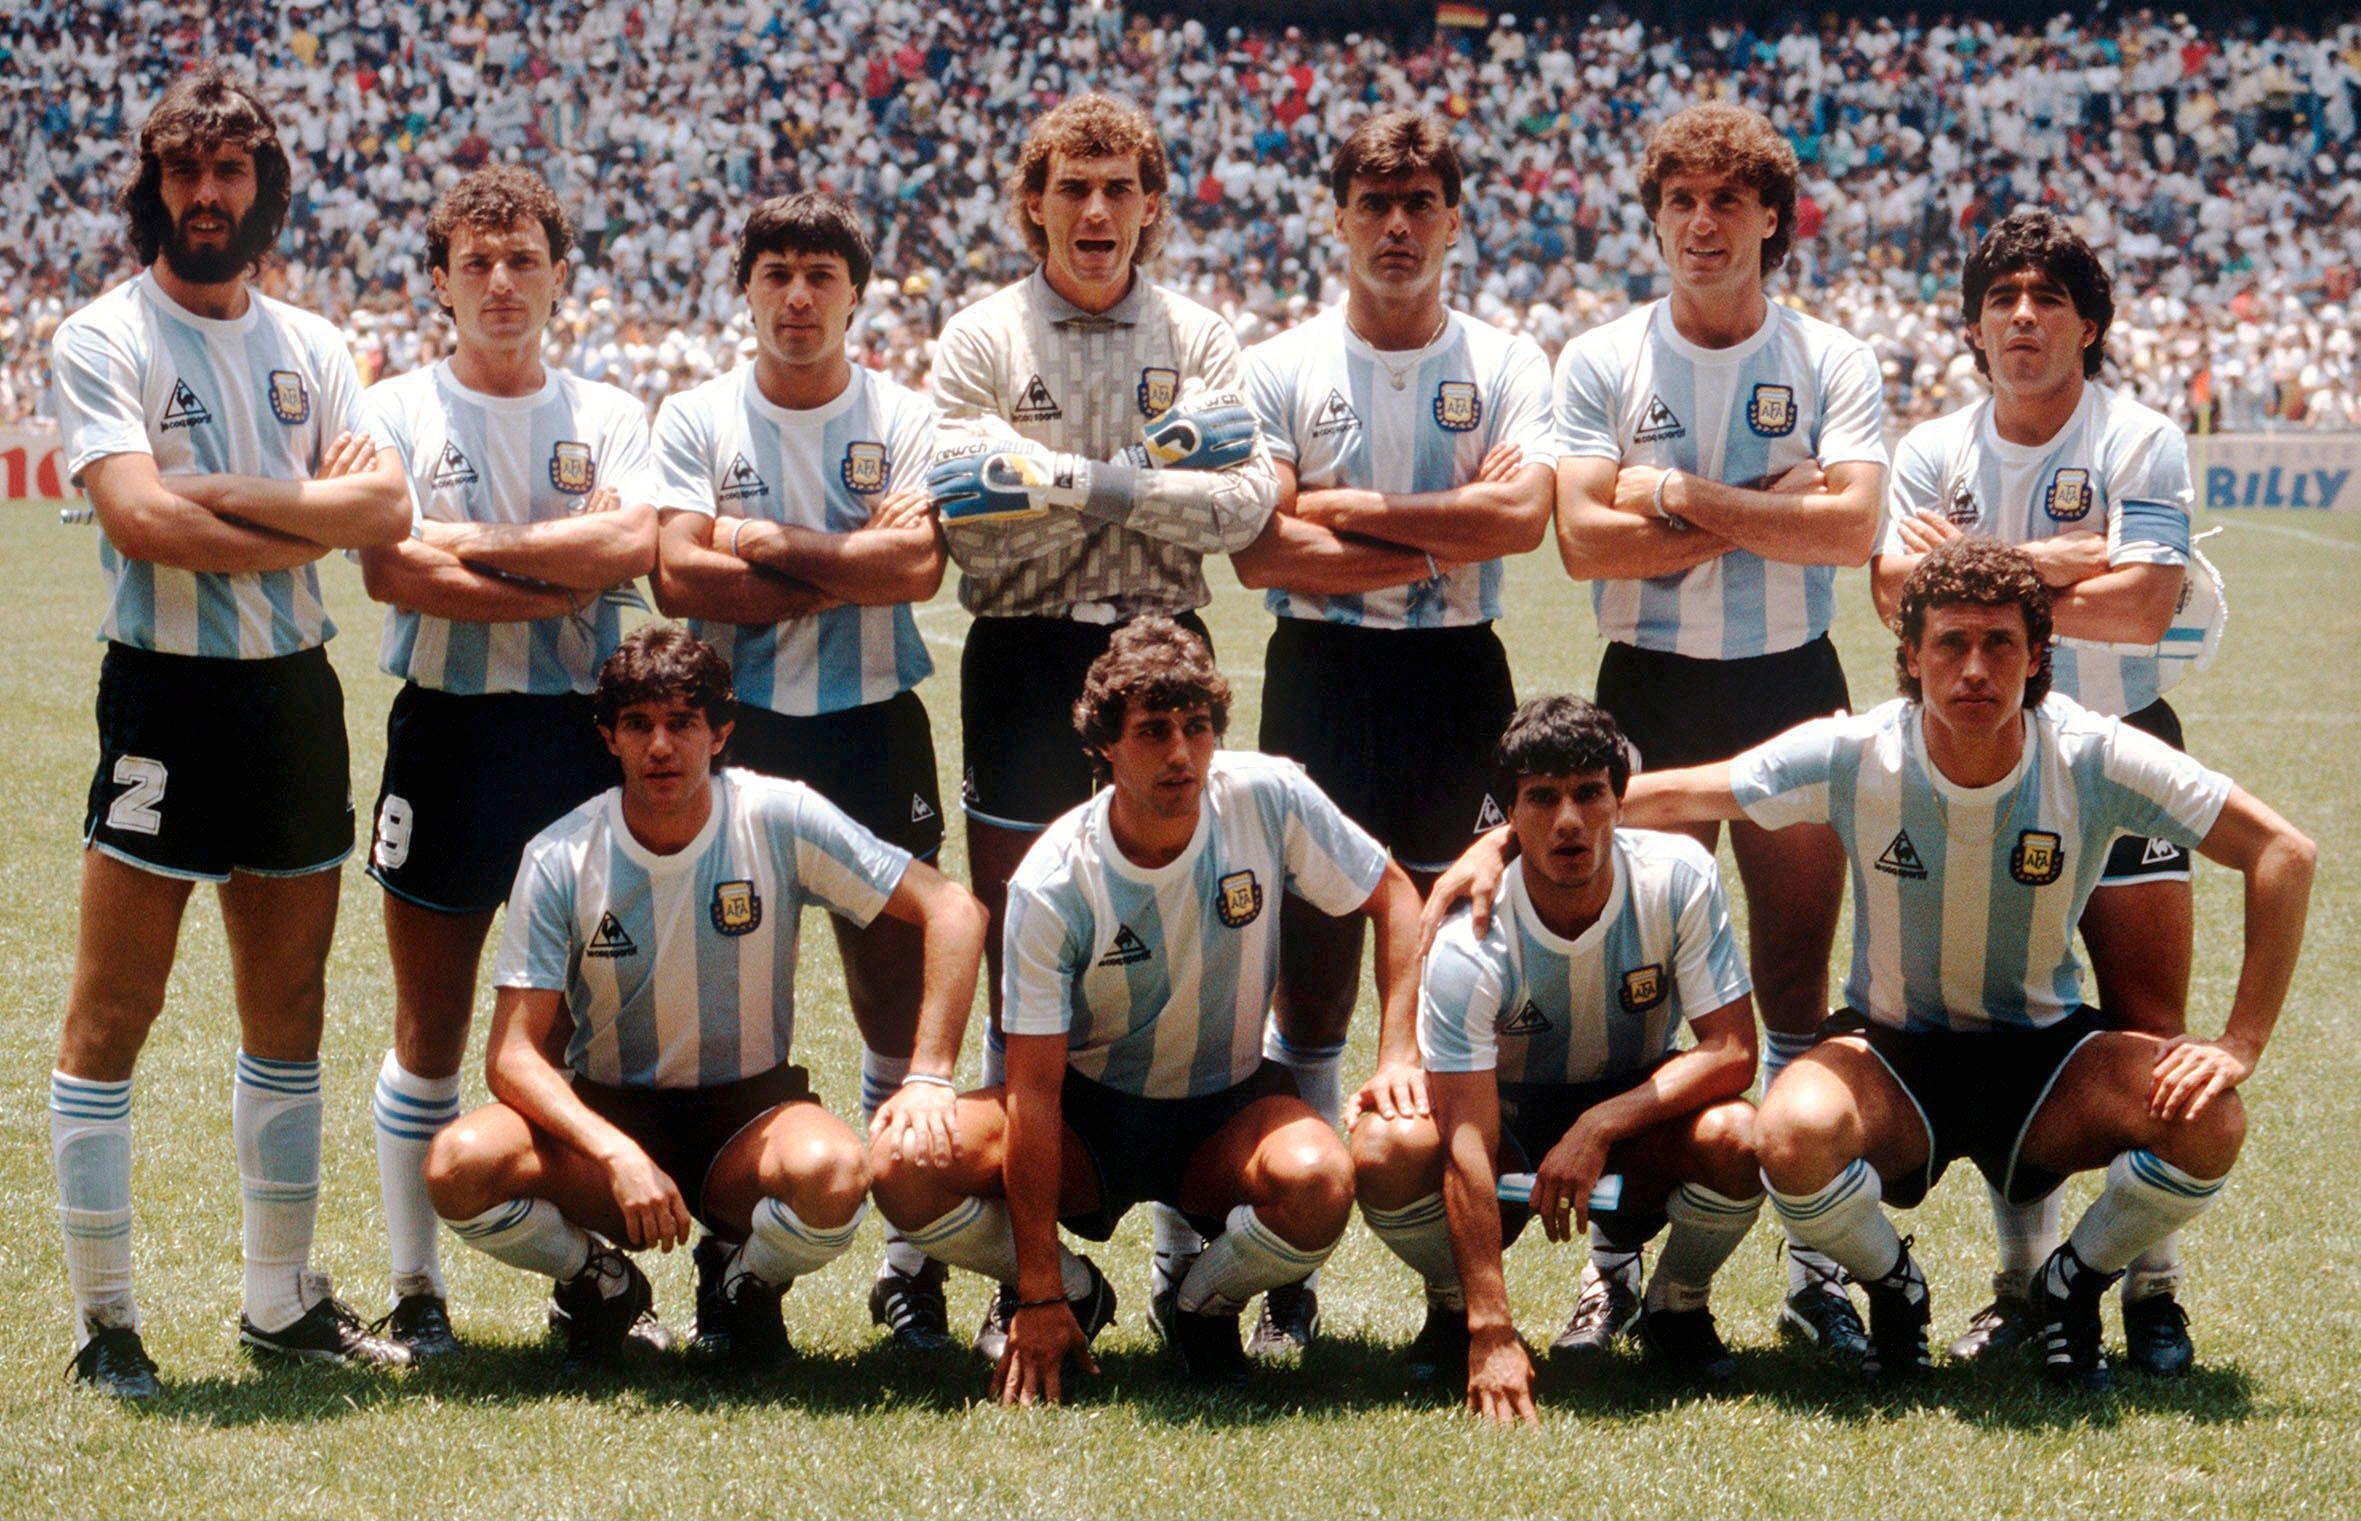 Символ футбола. ФОТО галерея памяти Диего Марадоны - фото 16